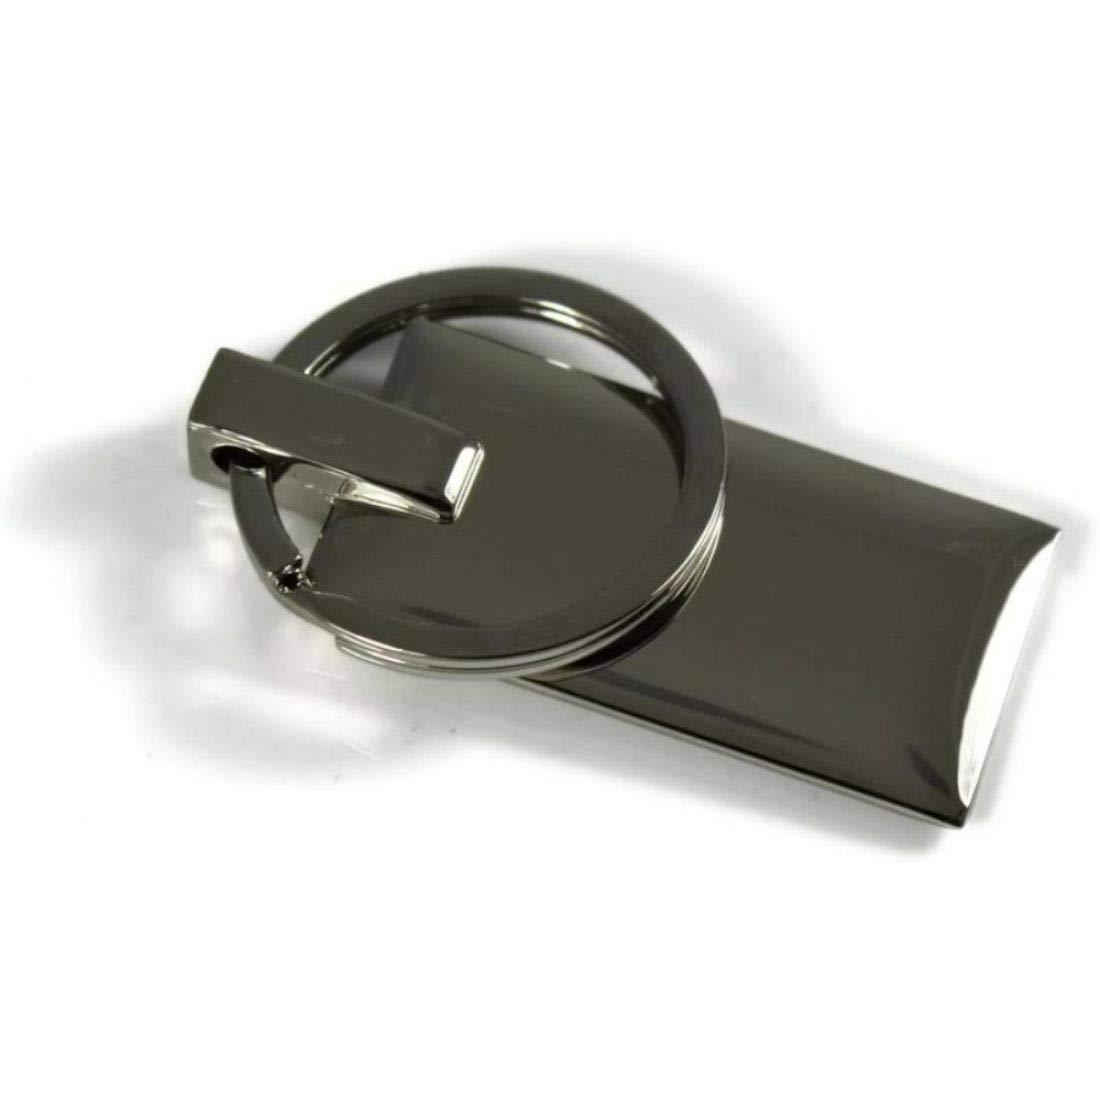 Honda Civic Pink Crystal Rhinestone Key Fob Authentic Logo Key Chain Key Ring Keychain Lanyard